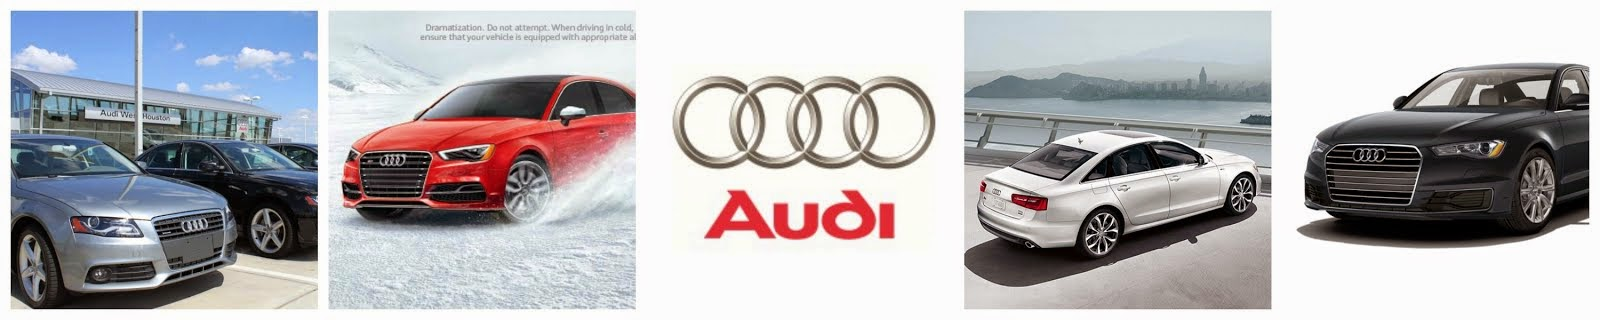 Audi West Houston Happy Mothers Day - Audi west houston